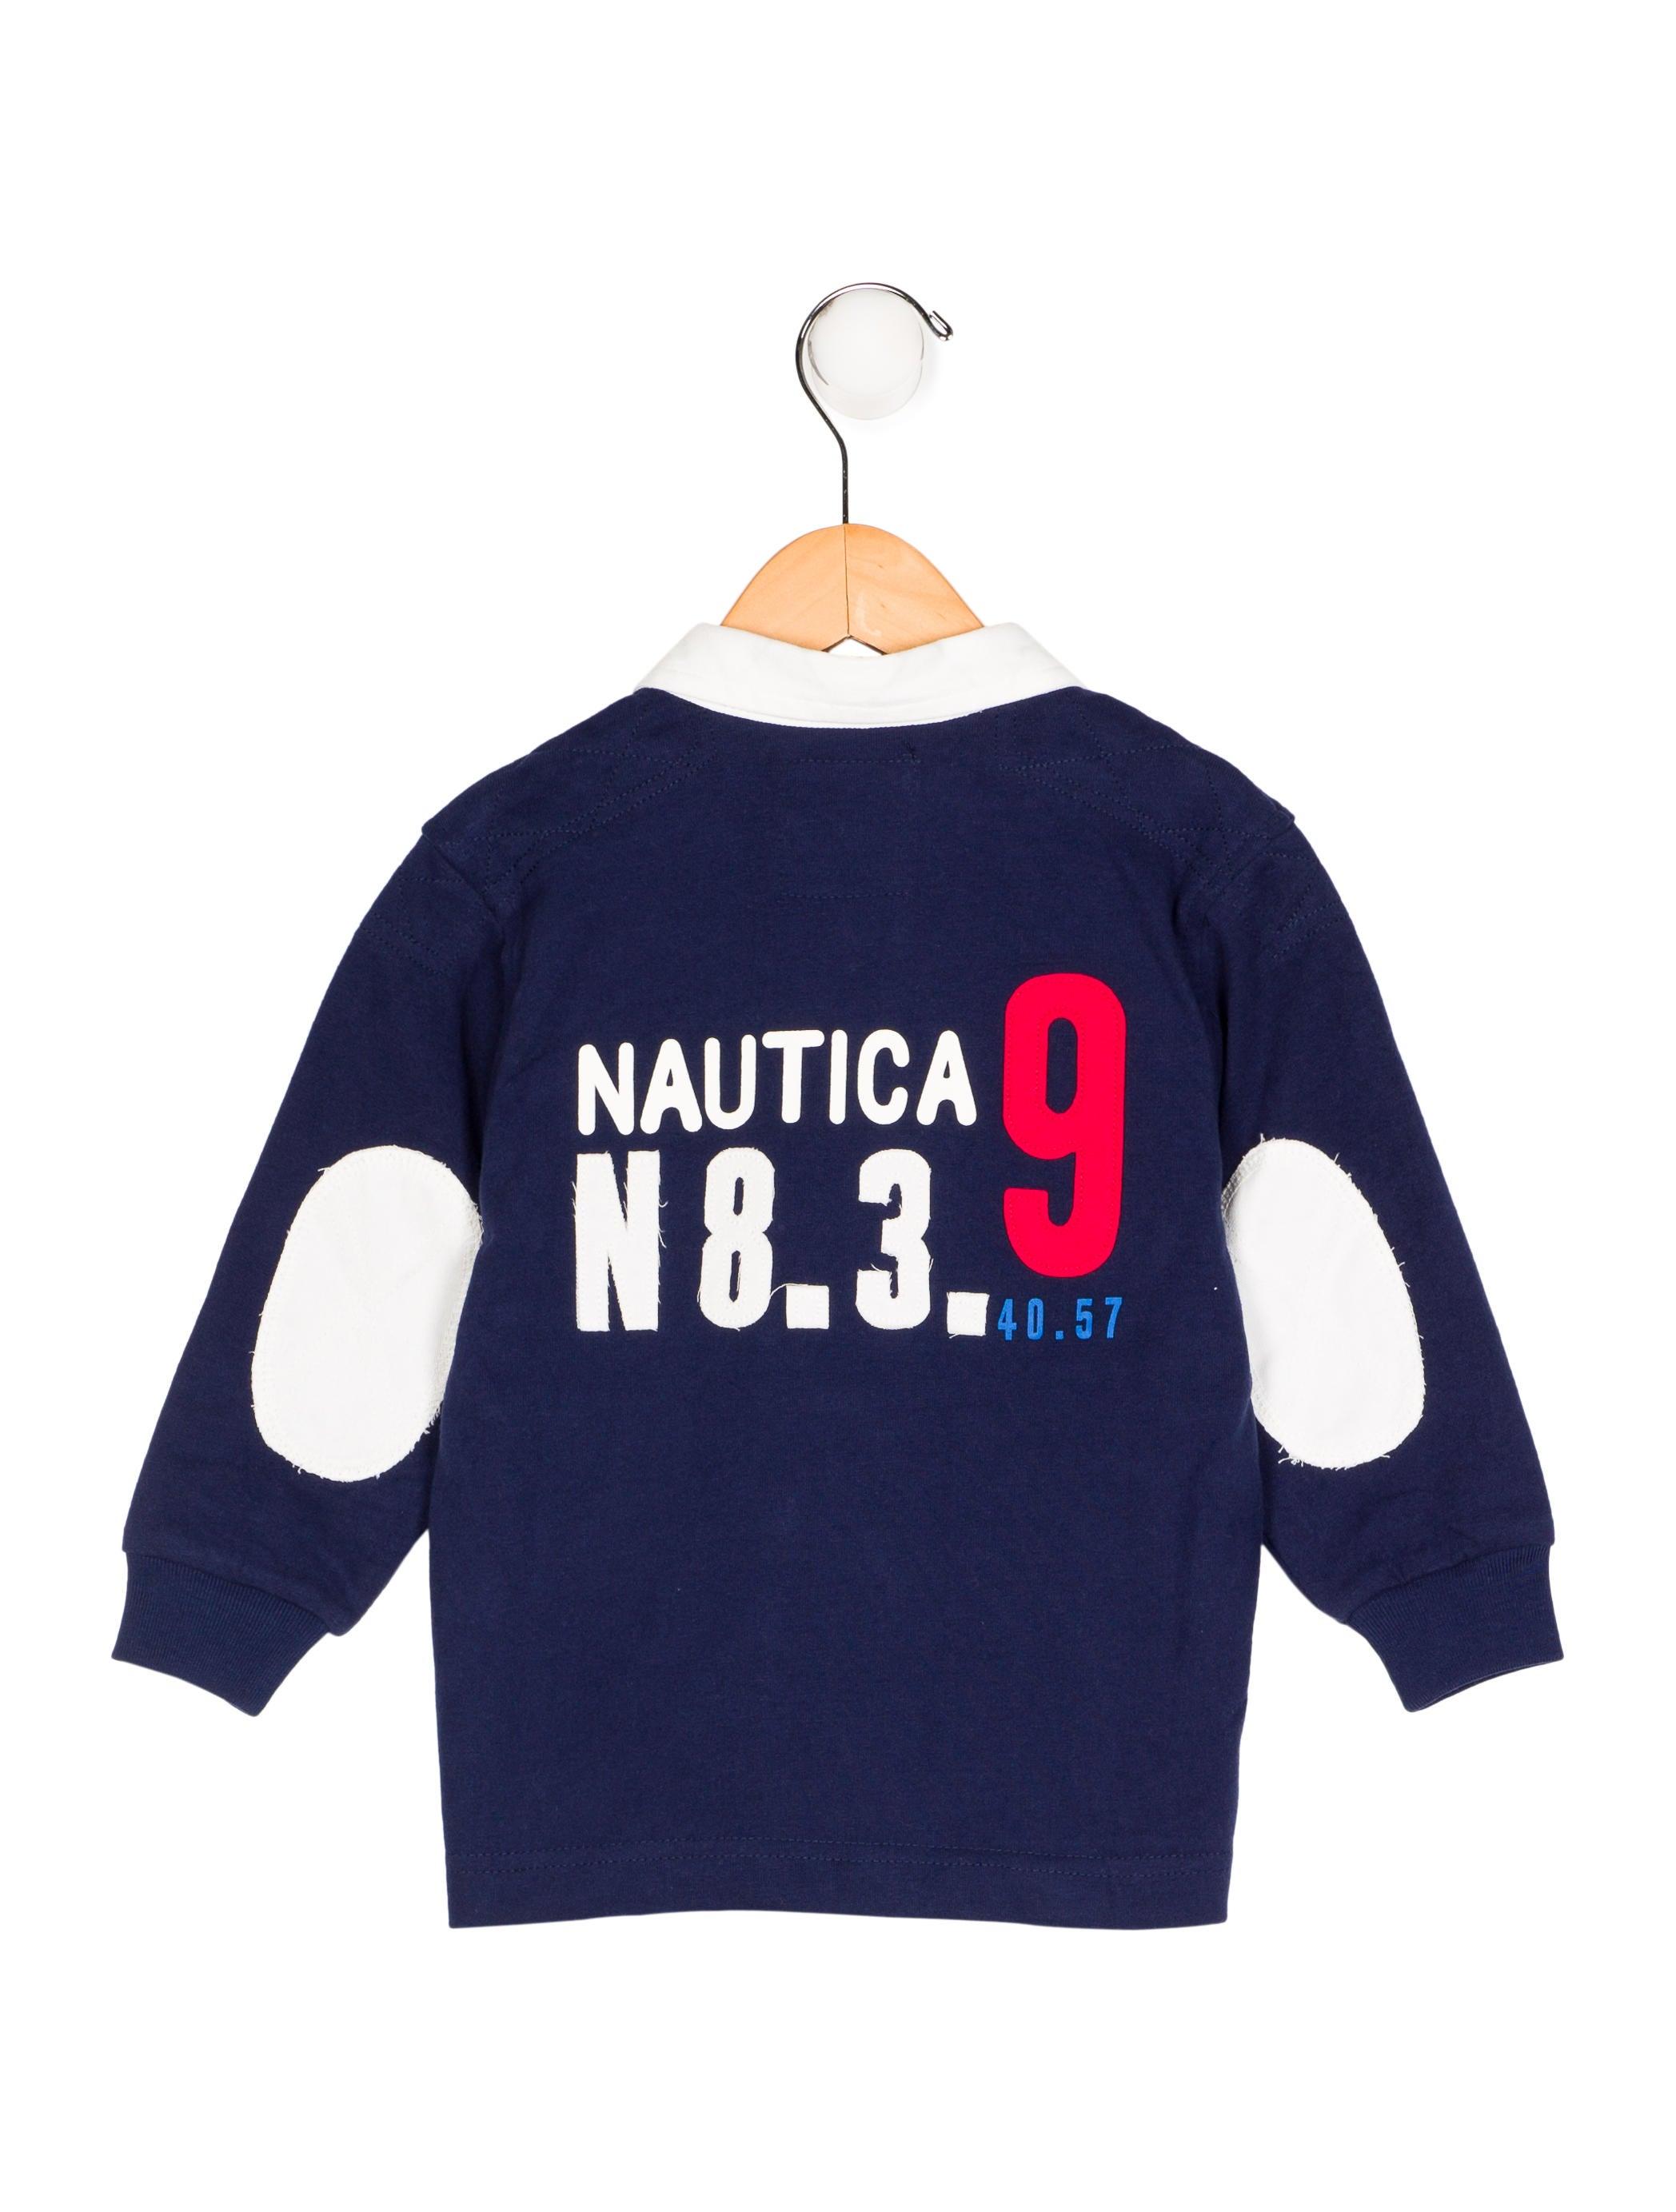 Nautica boys 39 long sleeve polo shirt boys wanuo20003 for Long sleeved polo shirts for boys